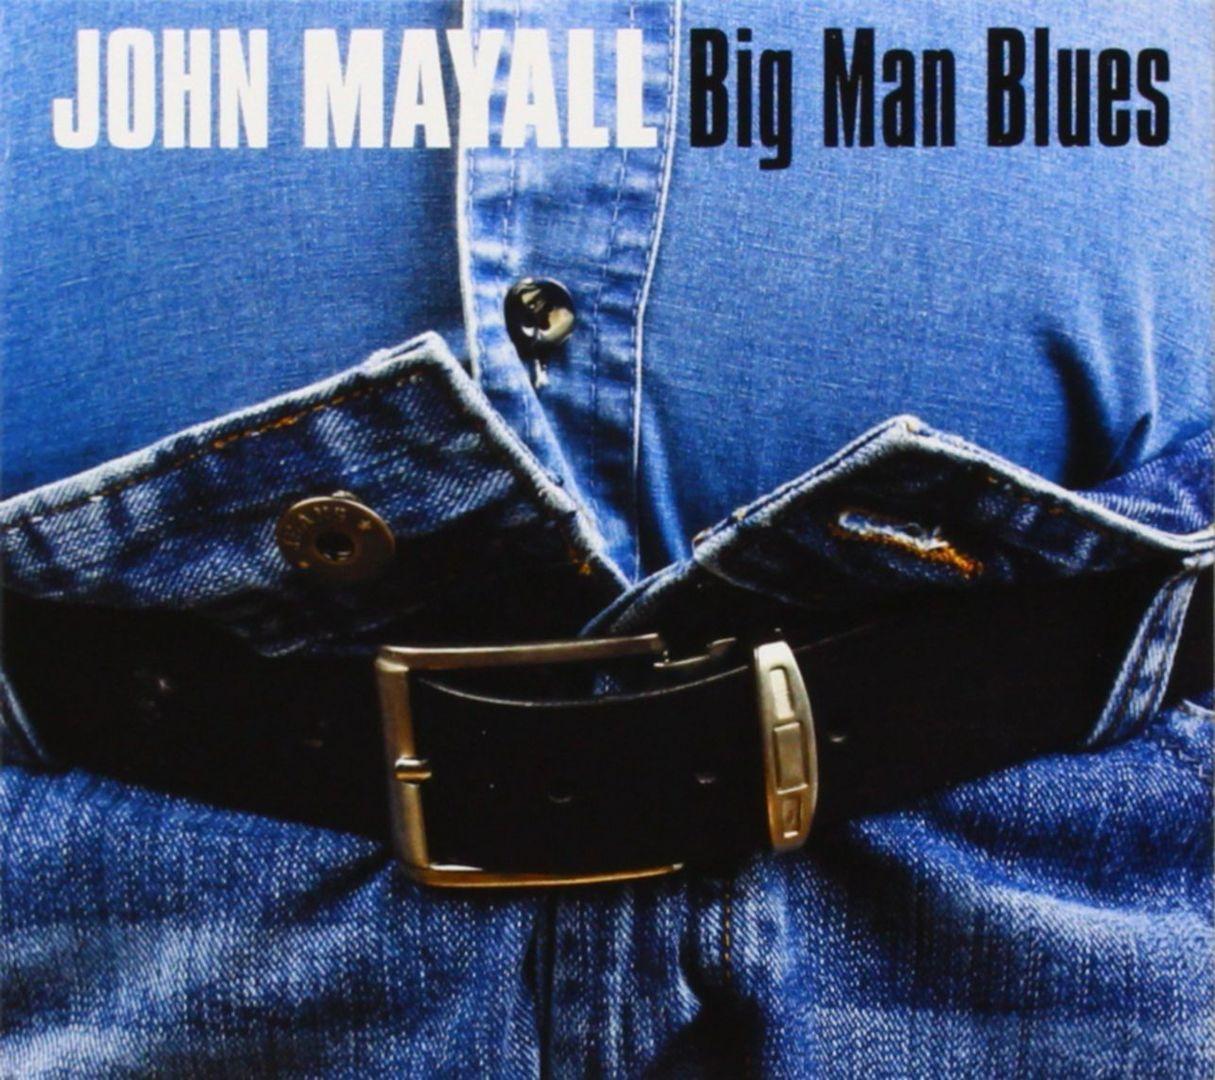 Sonderbar: BIG MAN BLUES (2012)